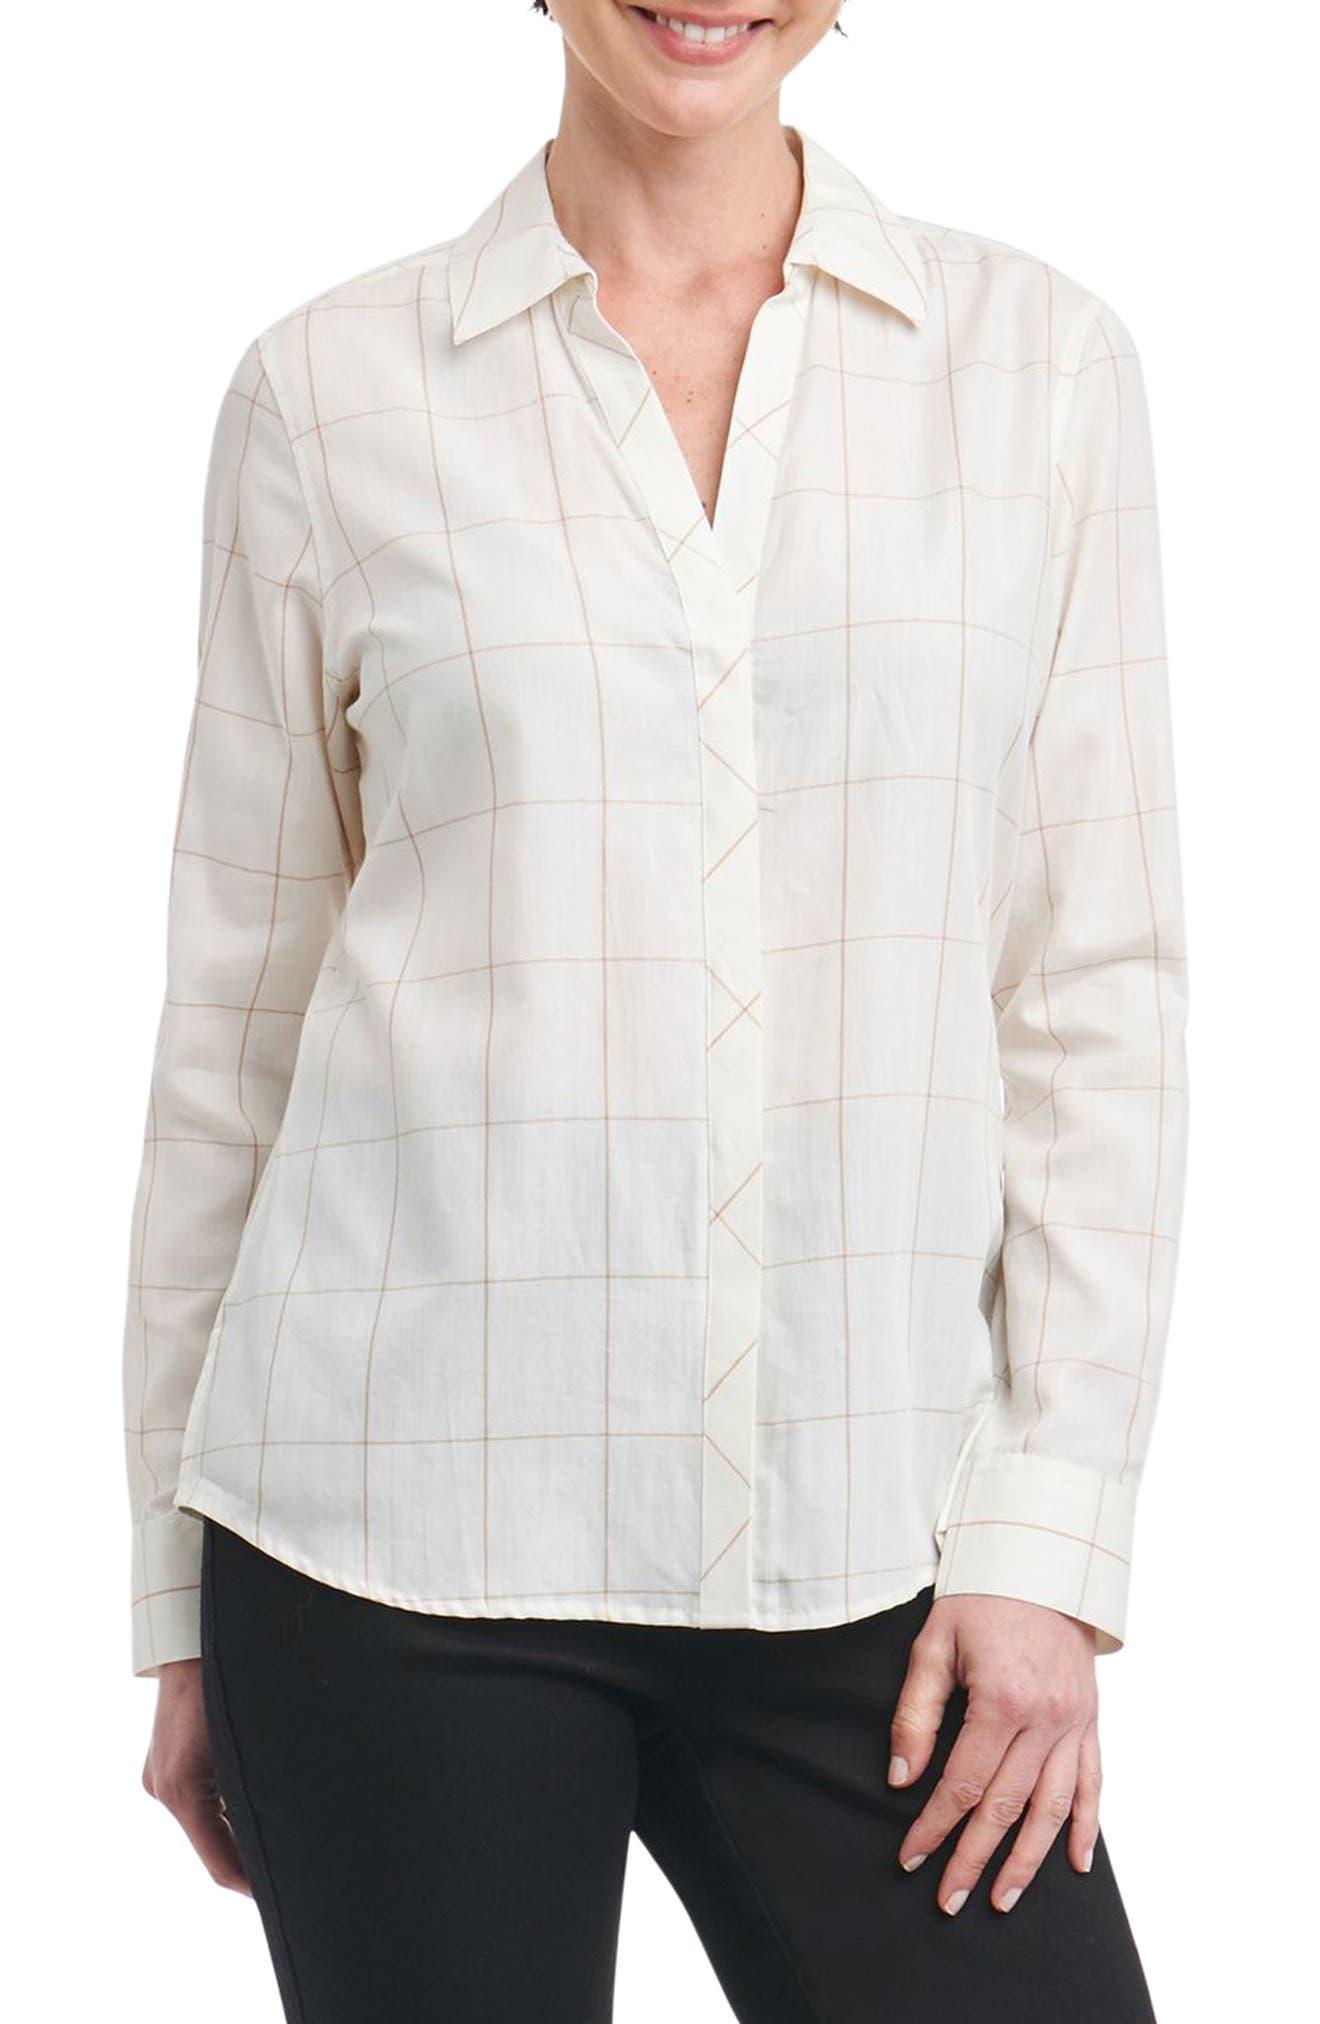 Nicole Windowpane Print Shirt,                             Main thumbnail 1, color,                             Ivory